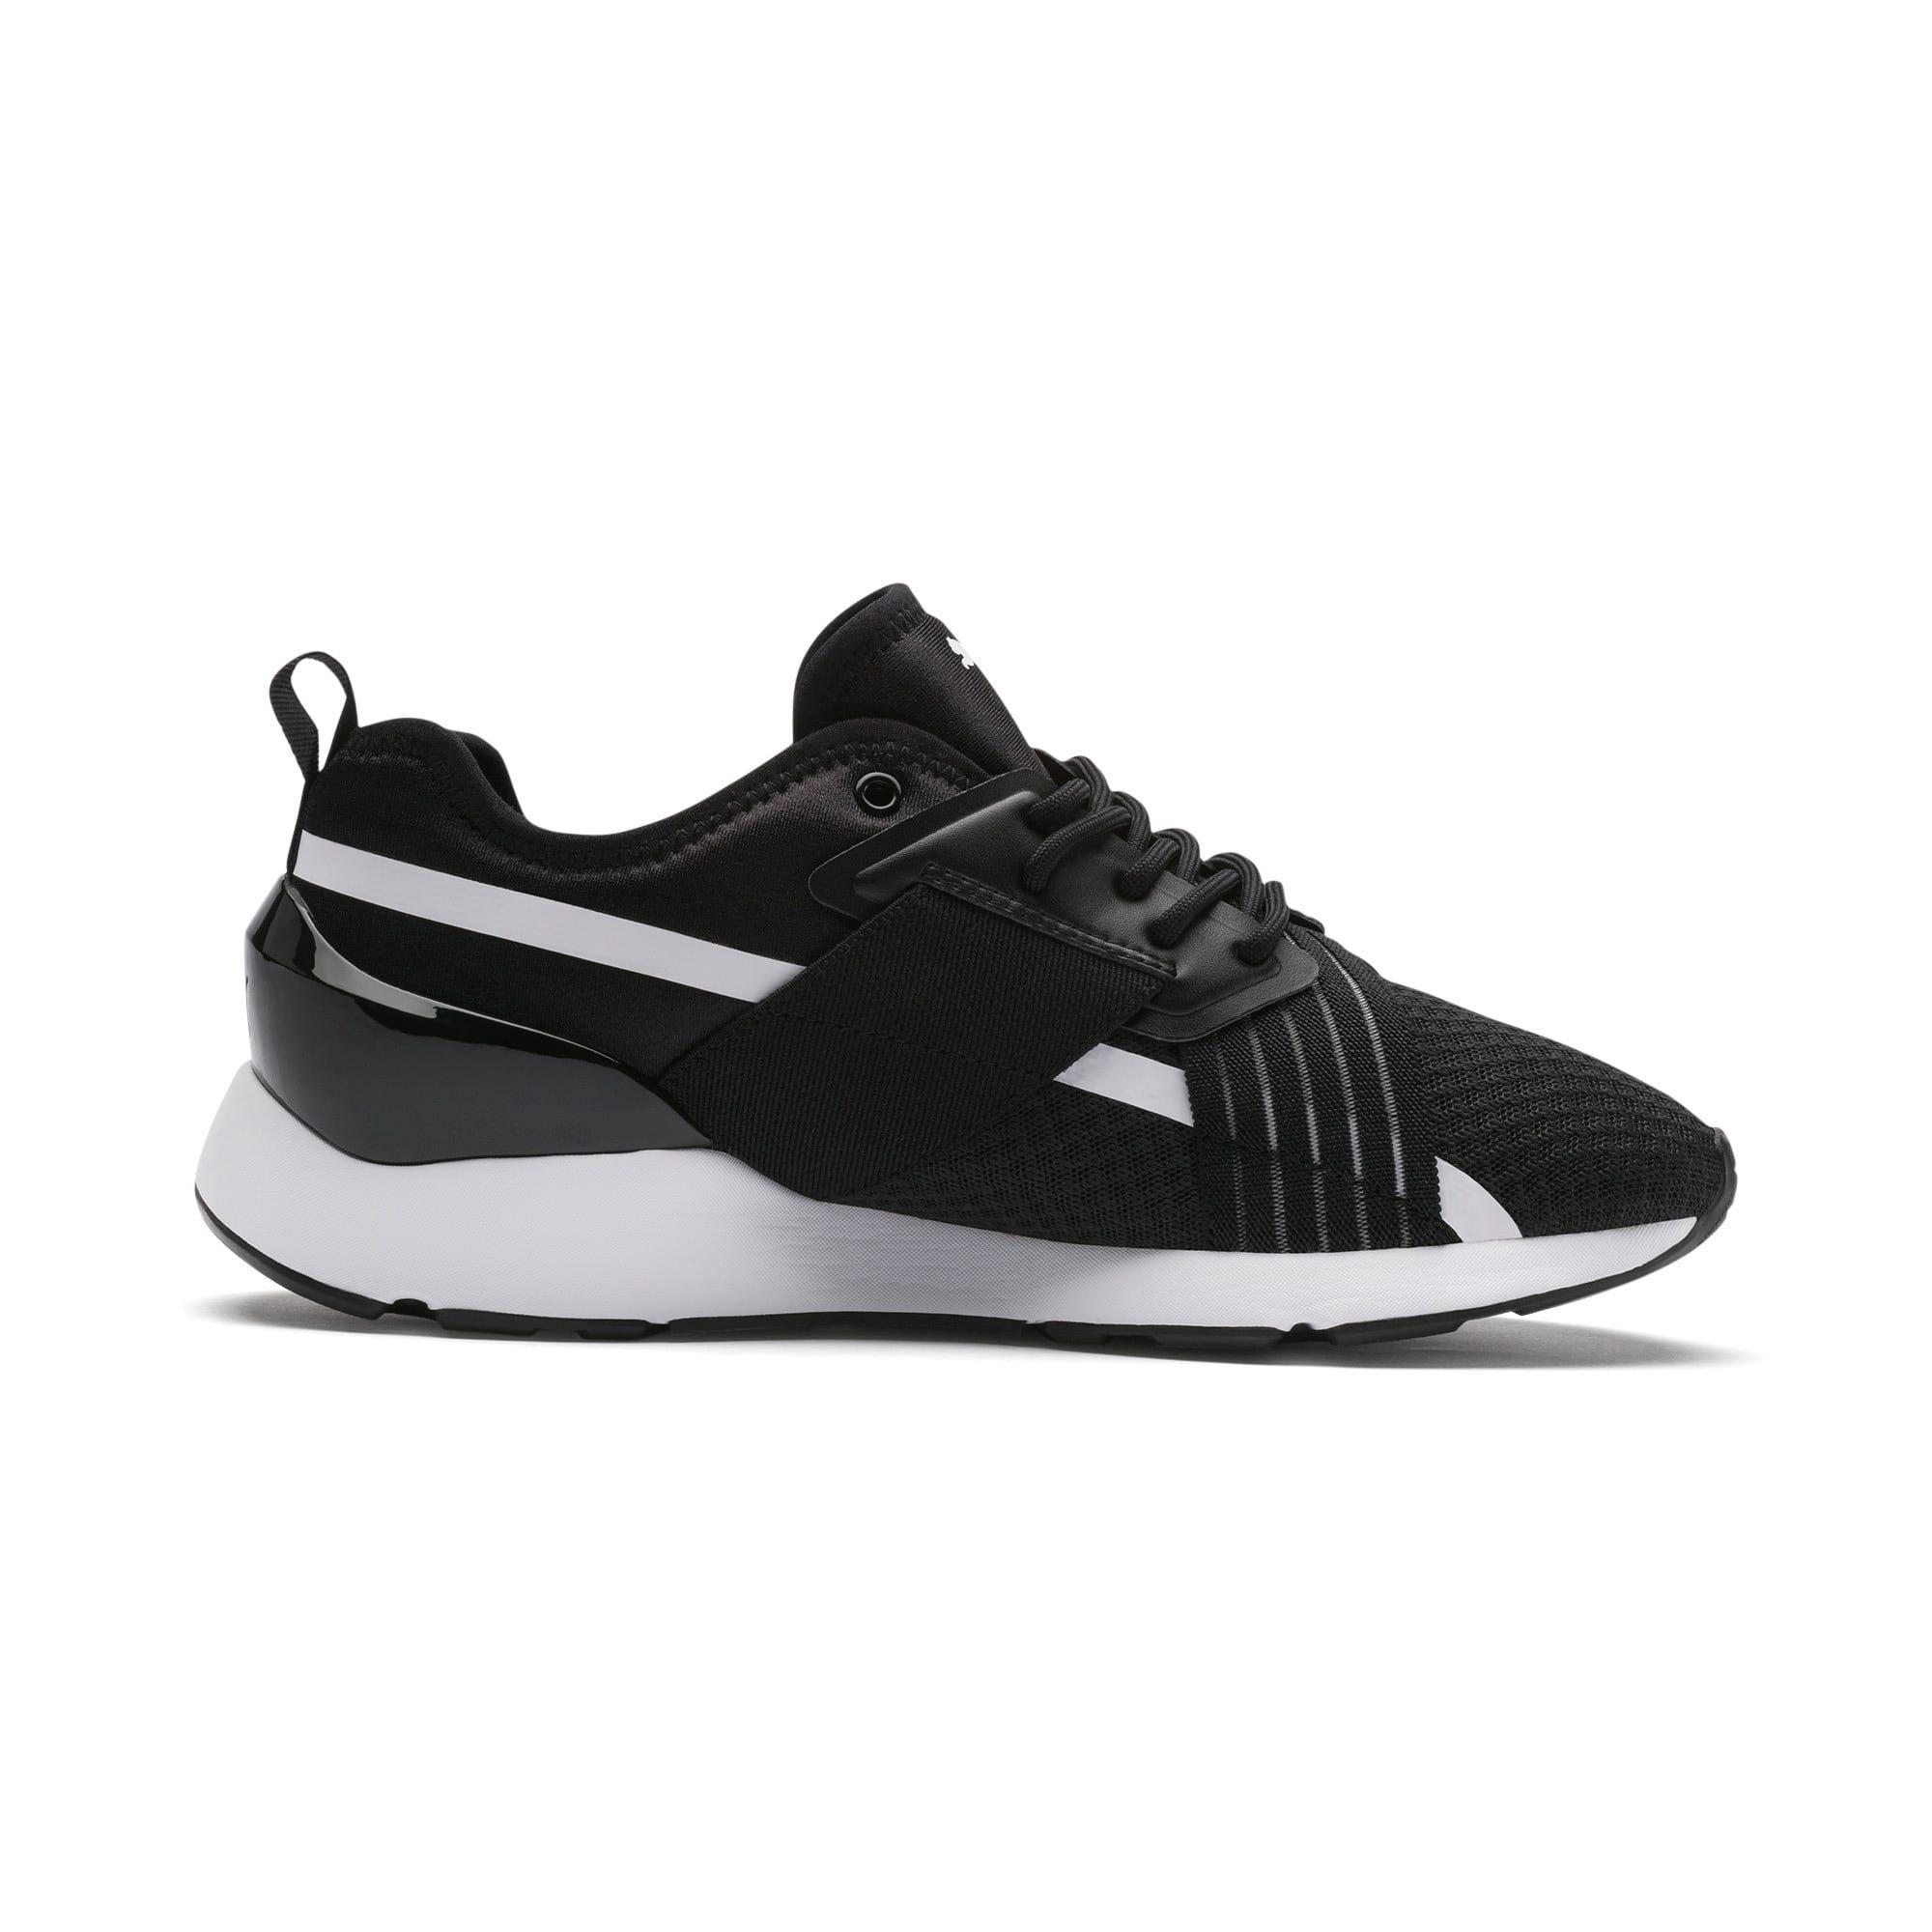 Thumbnail 5 of Muse X-2 Women's Sneakers, Puma Black-Puma White, medium